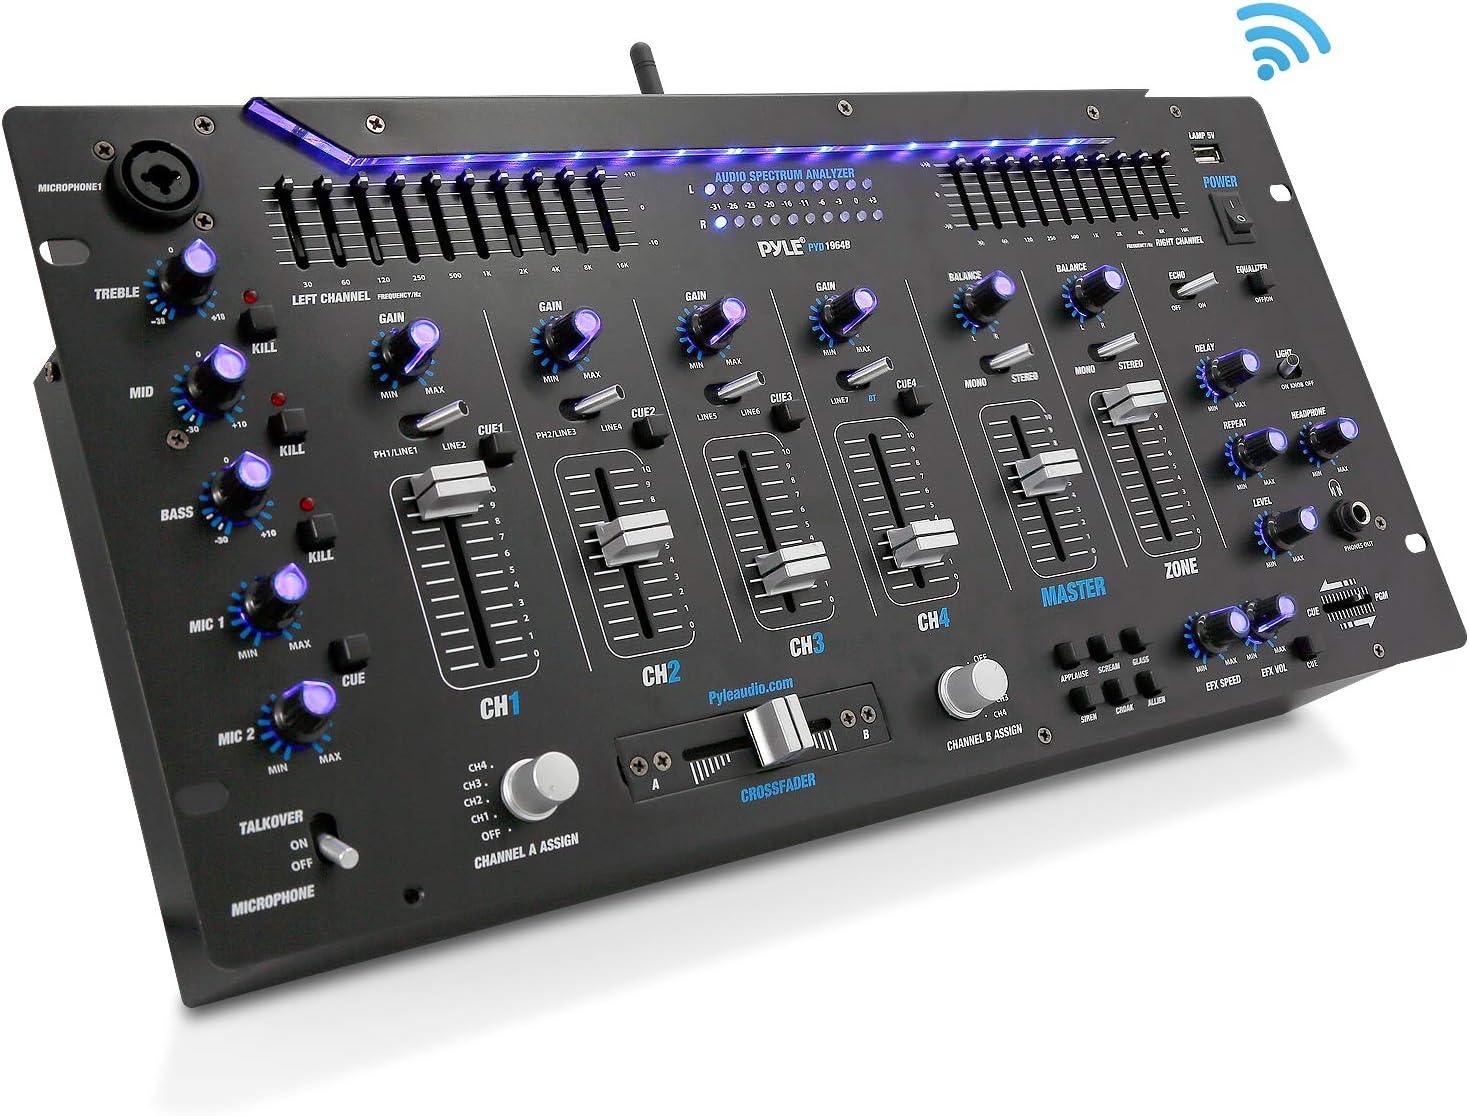 Pyle 6 Channel Mixer, Bluetooth DJ Controller, Stereo Mixer, Professional Sound System, LED Illumination, Mixer Digital Audio, Digital Mixing System, Speed Control, 5U Rack Mount System, PYD1964B.5